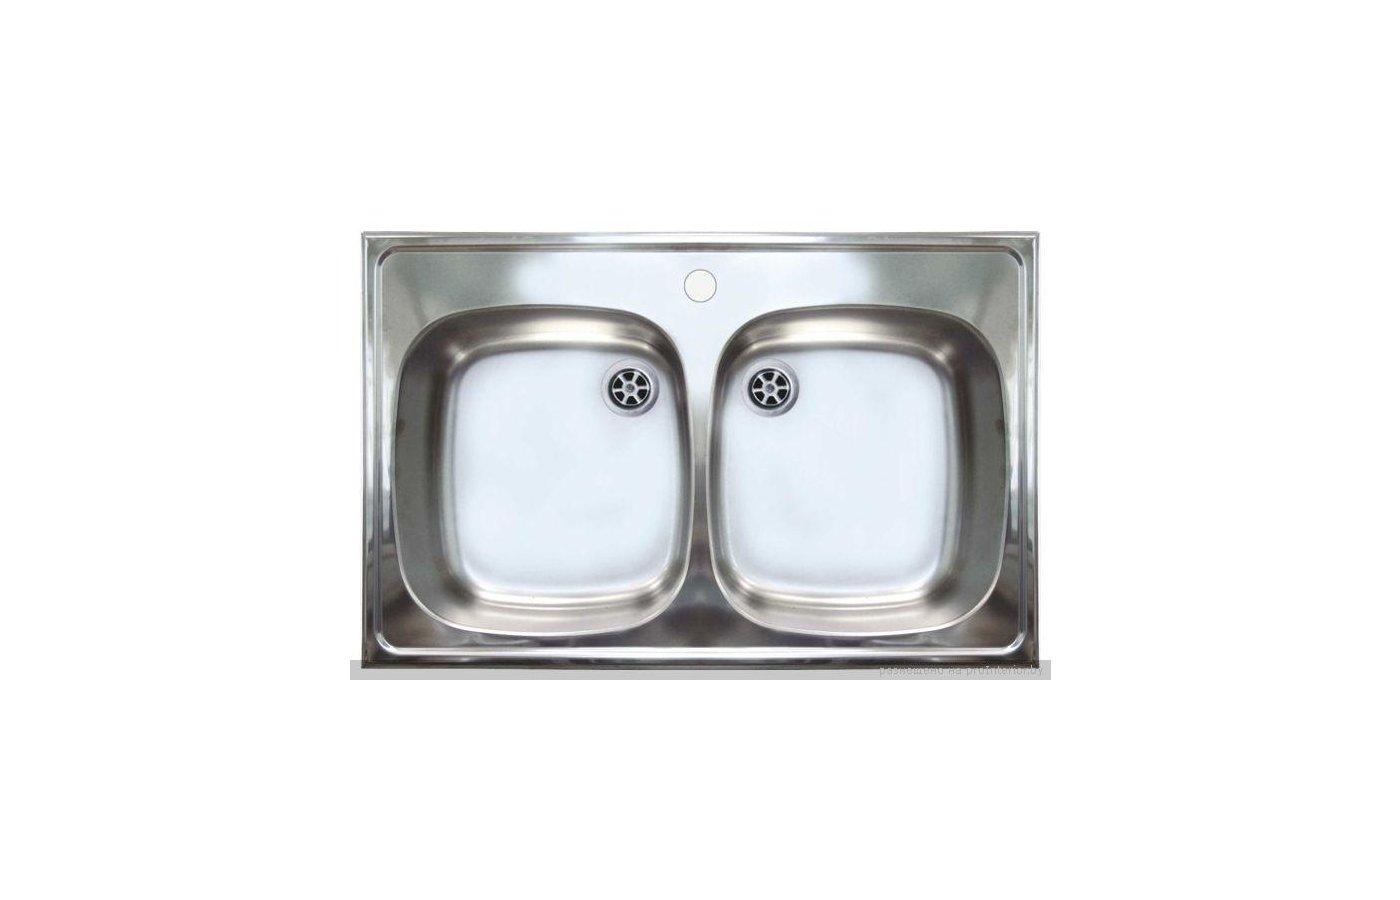 Кухонная мойка FRANKE ETX 620-50 Вентиль 1.5 + комплект для монтажа